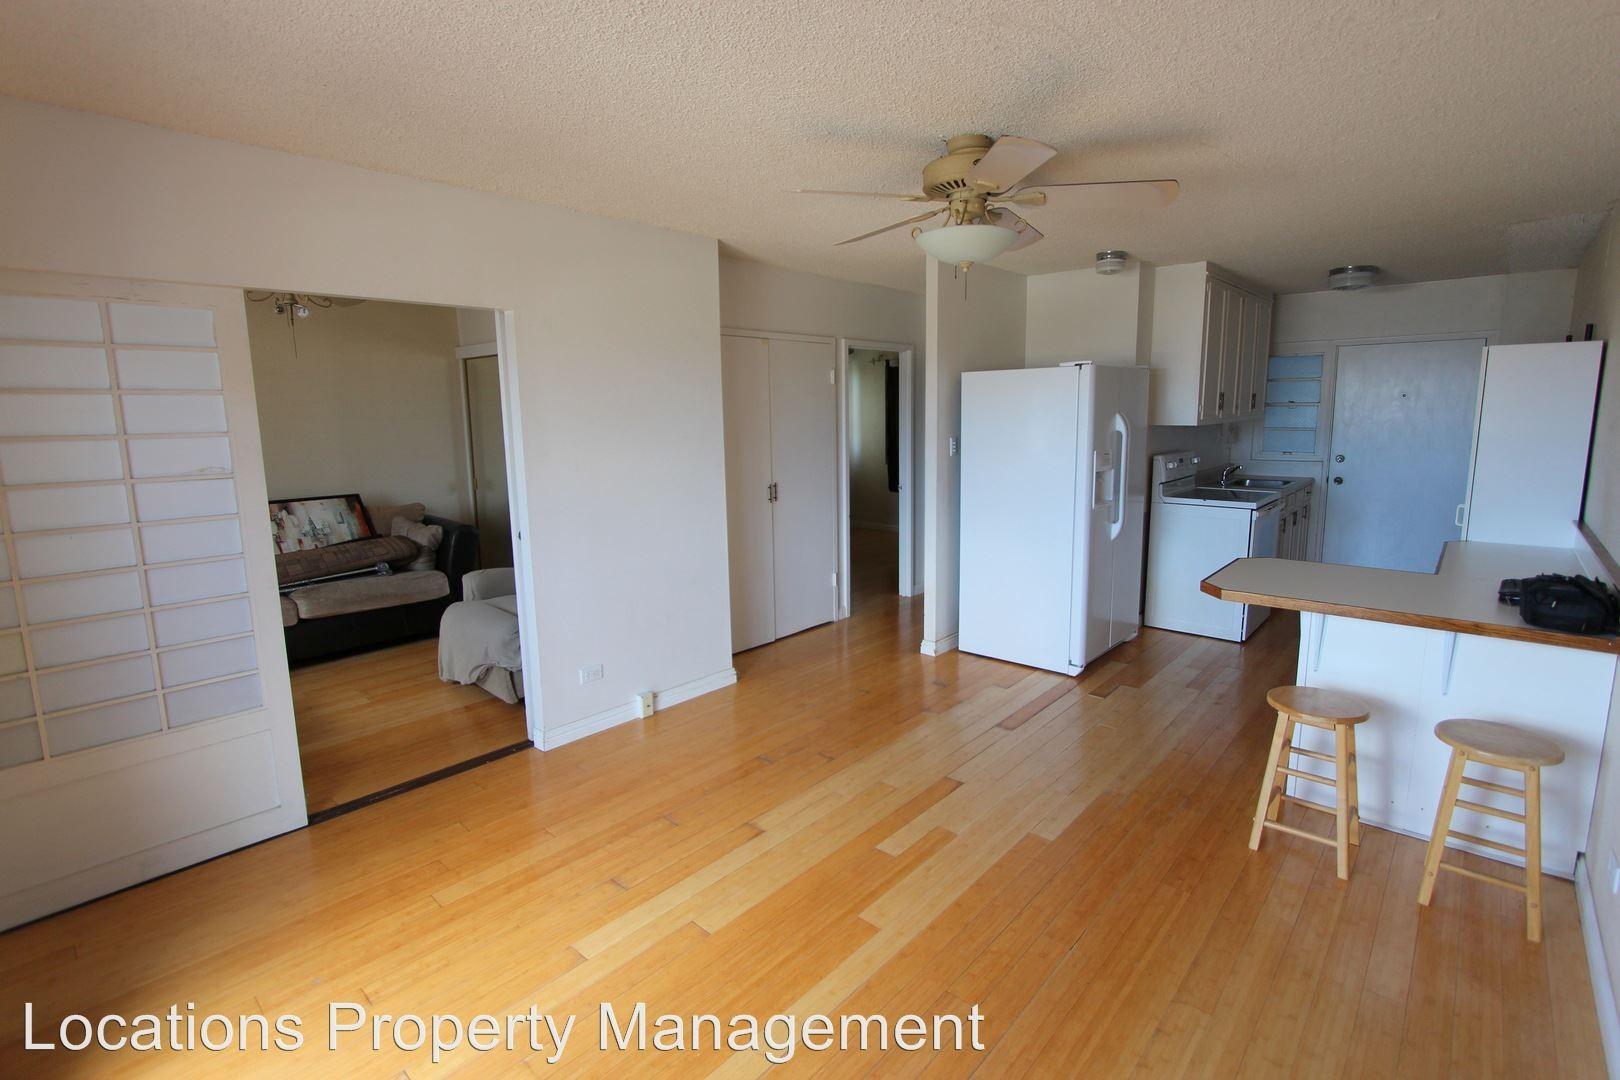 1402 Piikoi St 602 Honolulu Hi 96822 2 Bedroom Apartment For Rent Padmapper